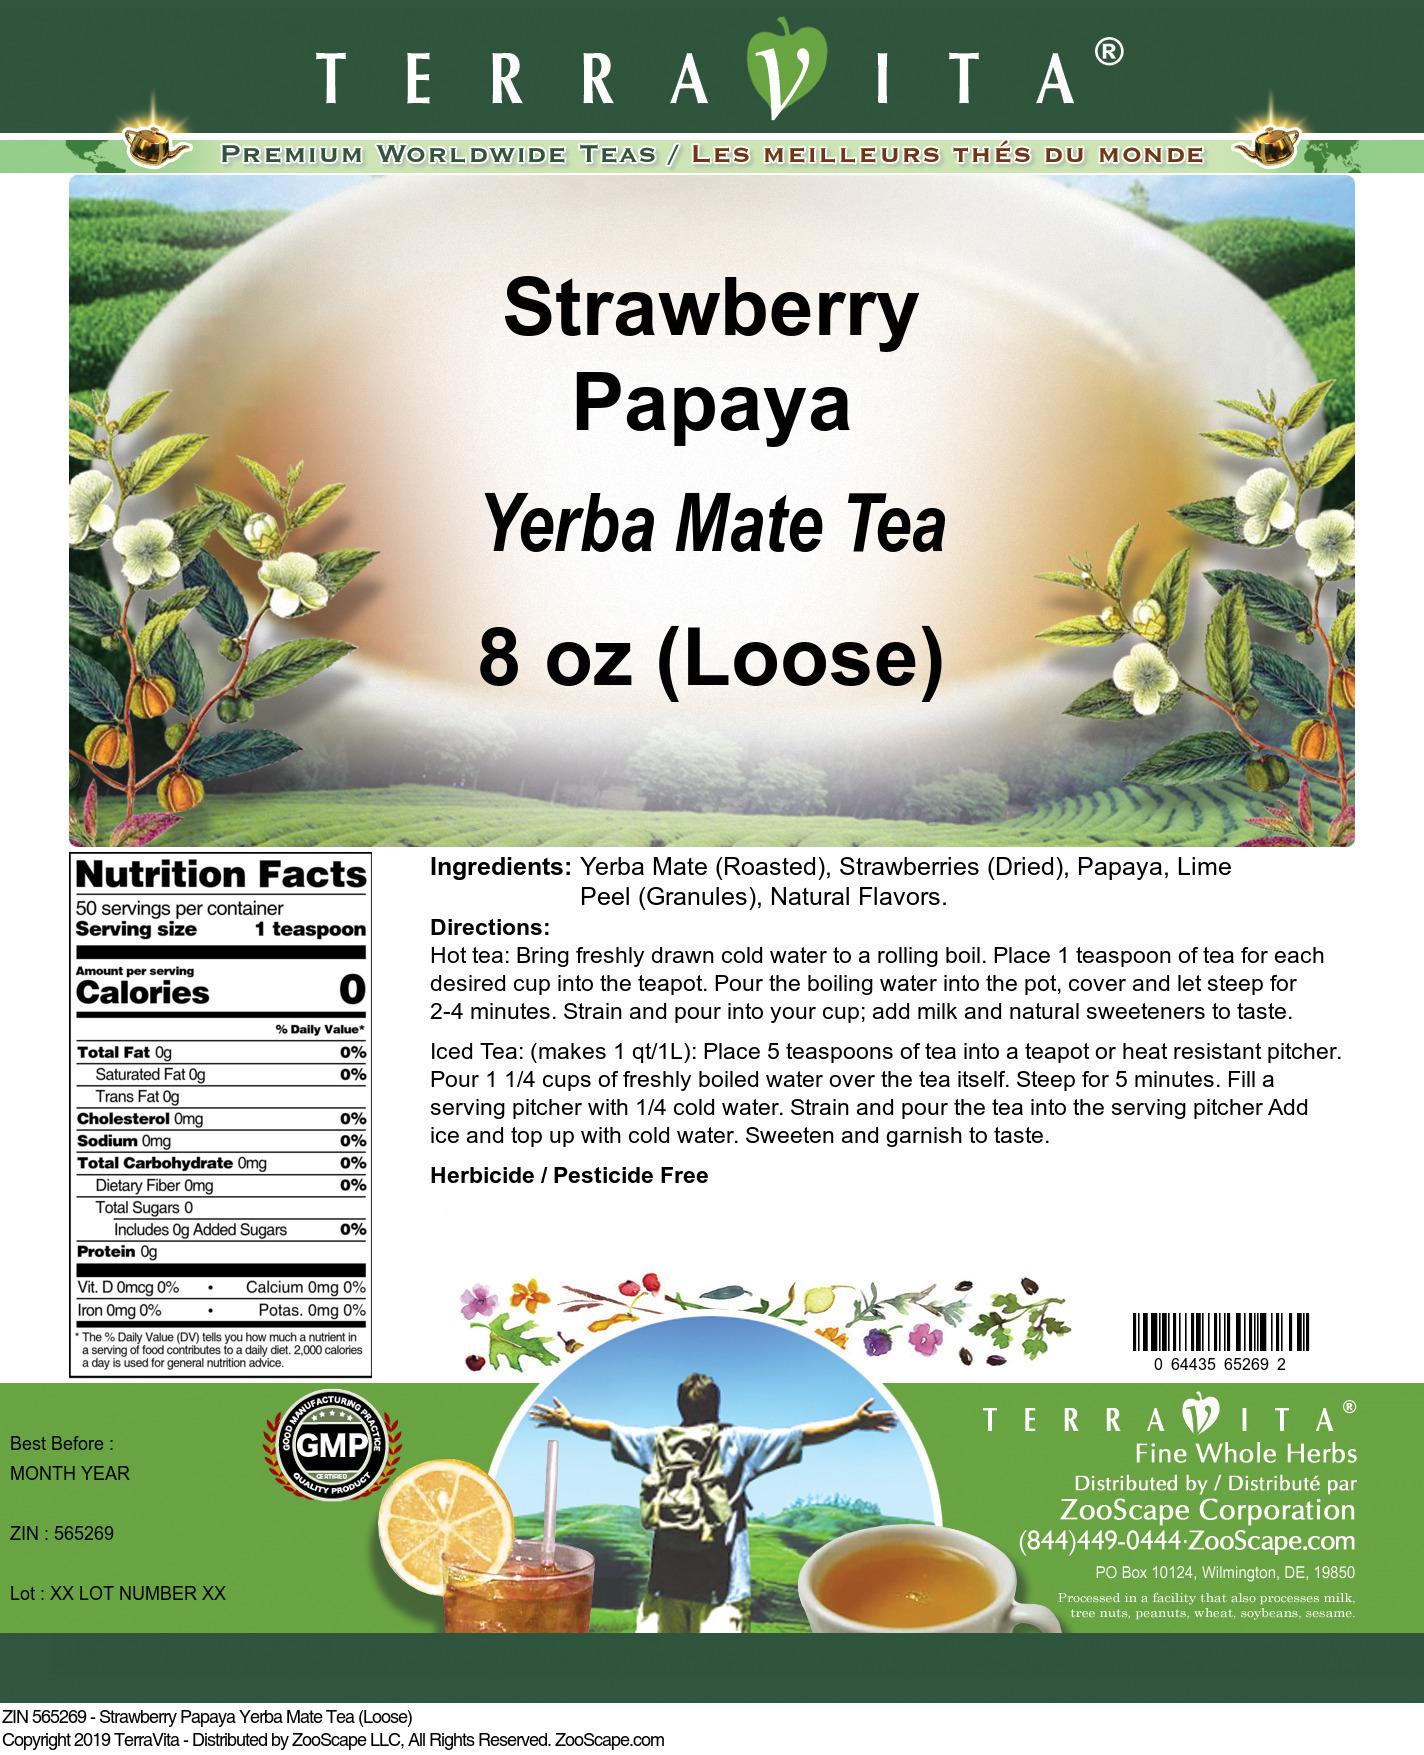 Strawberry Papaya Yerba Mate Tea (Loose)